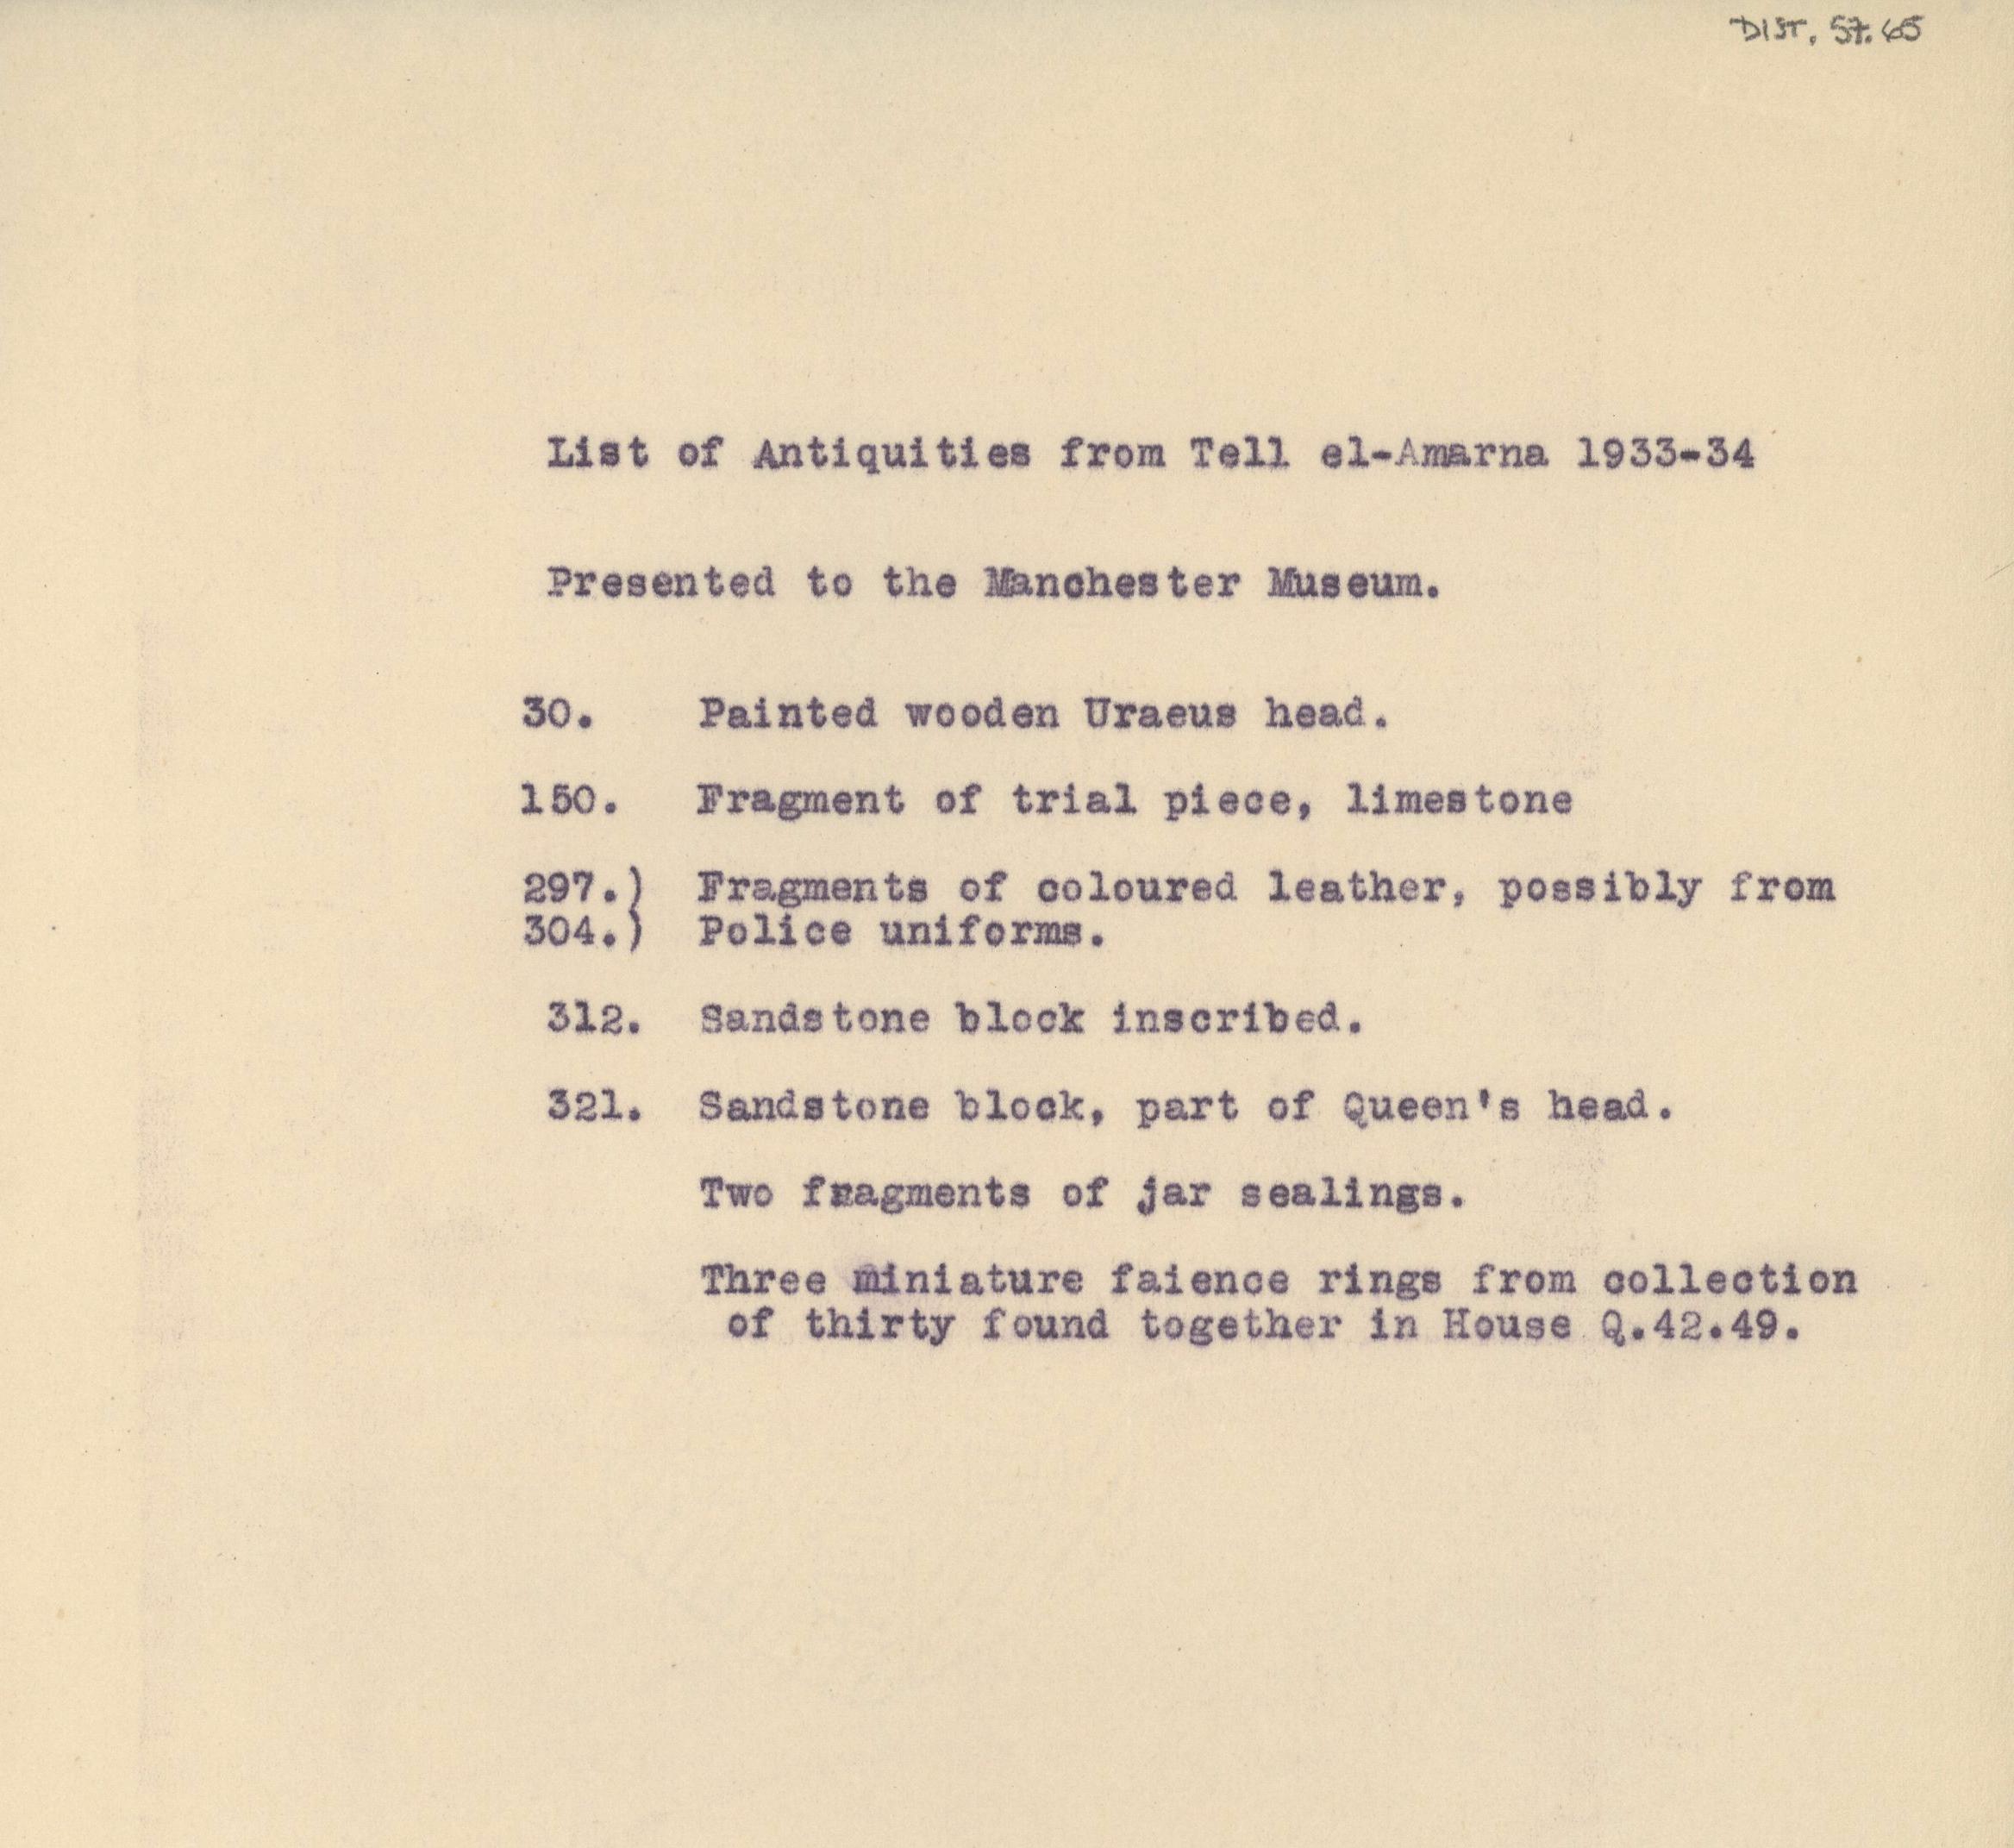 1931-34 el-Amarna DIST.57.65